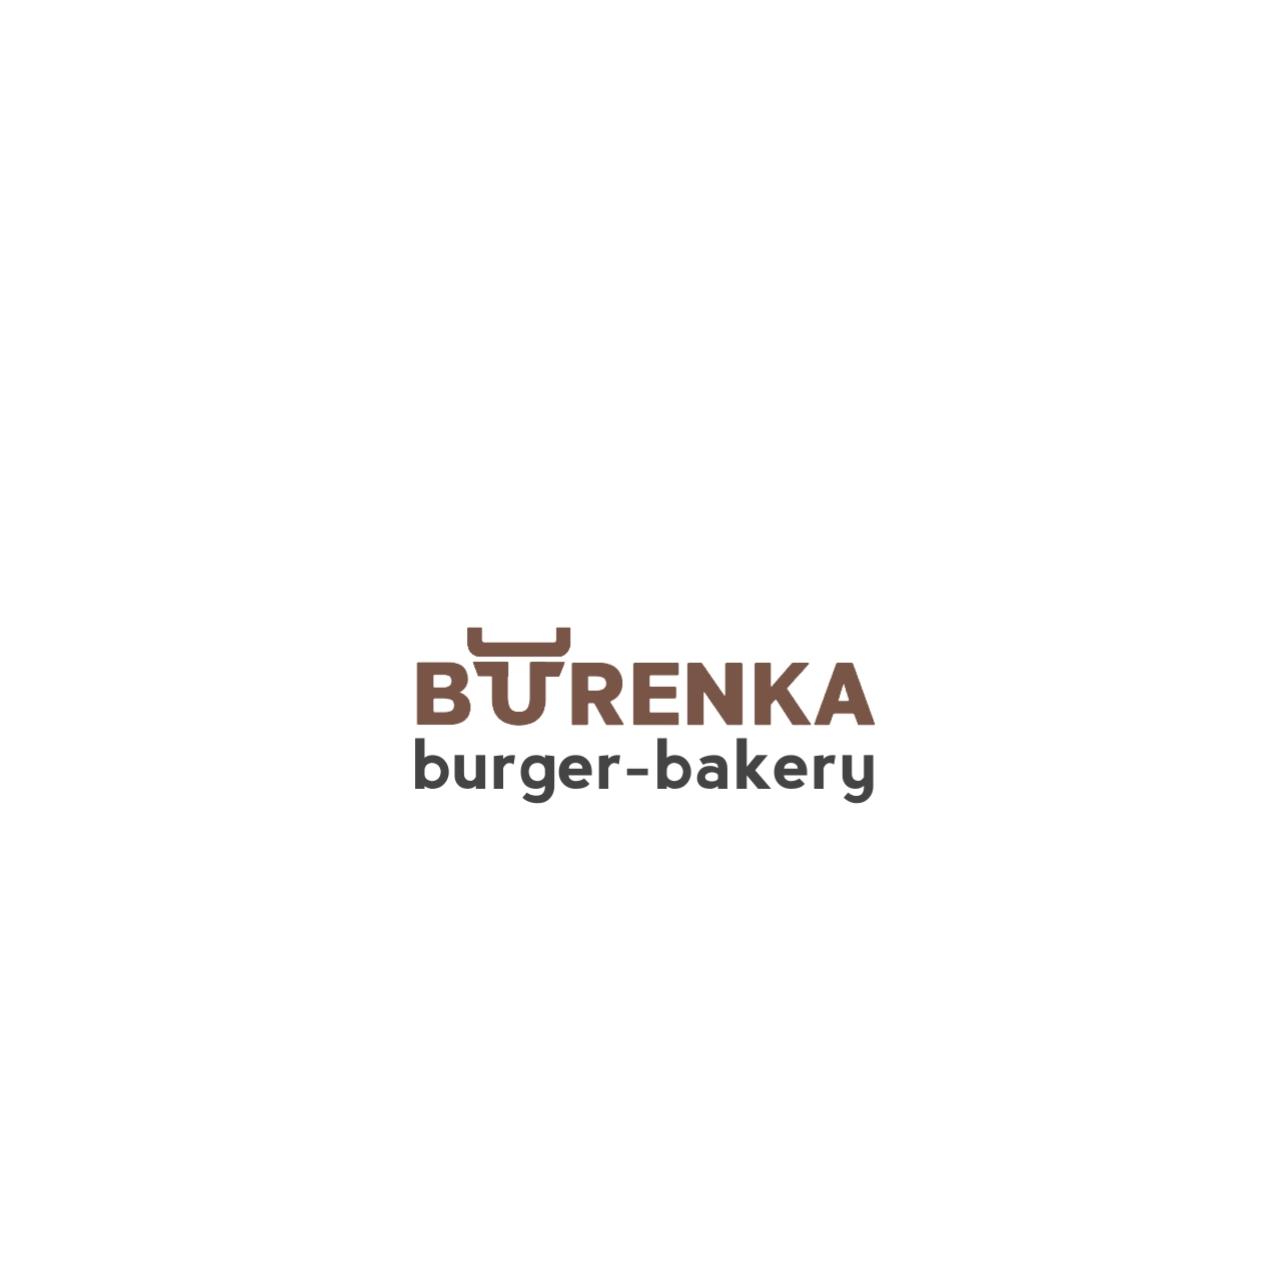 Логотип для Бургерной с Пекарней фото f_2545e134fa198cd4.jpg